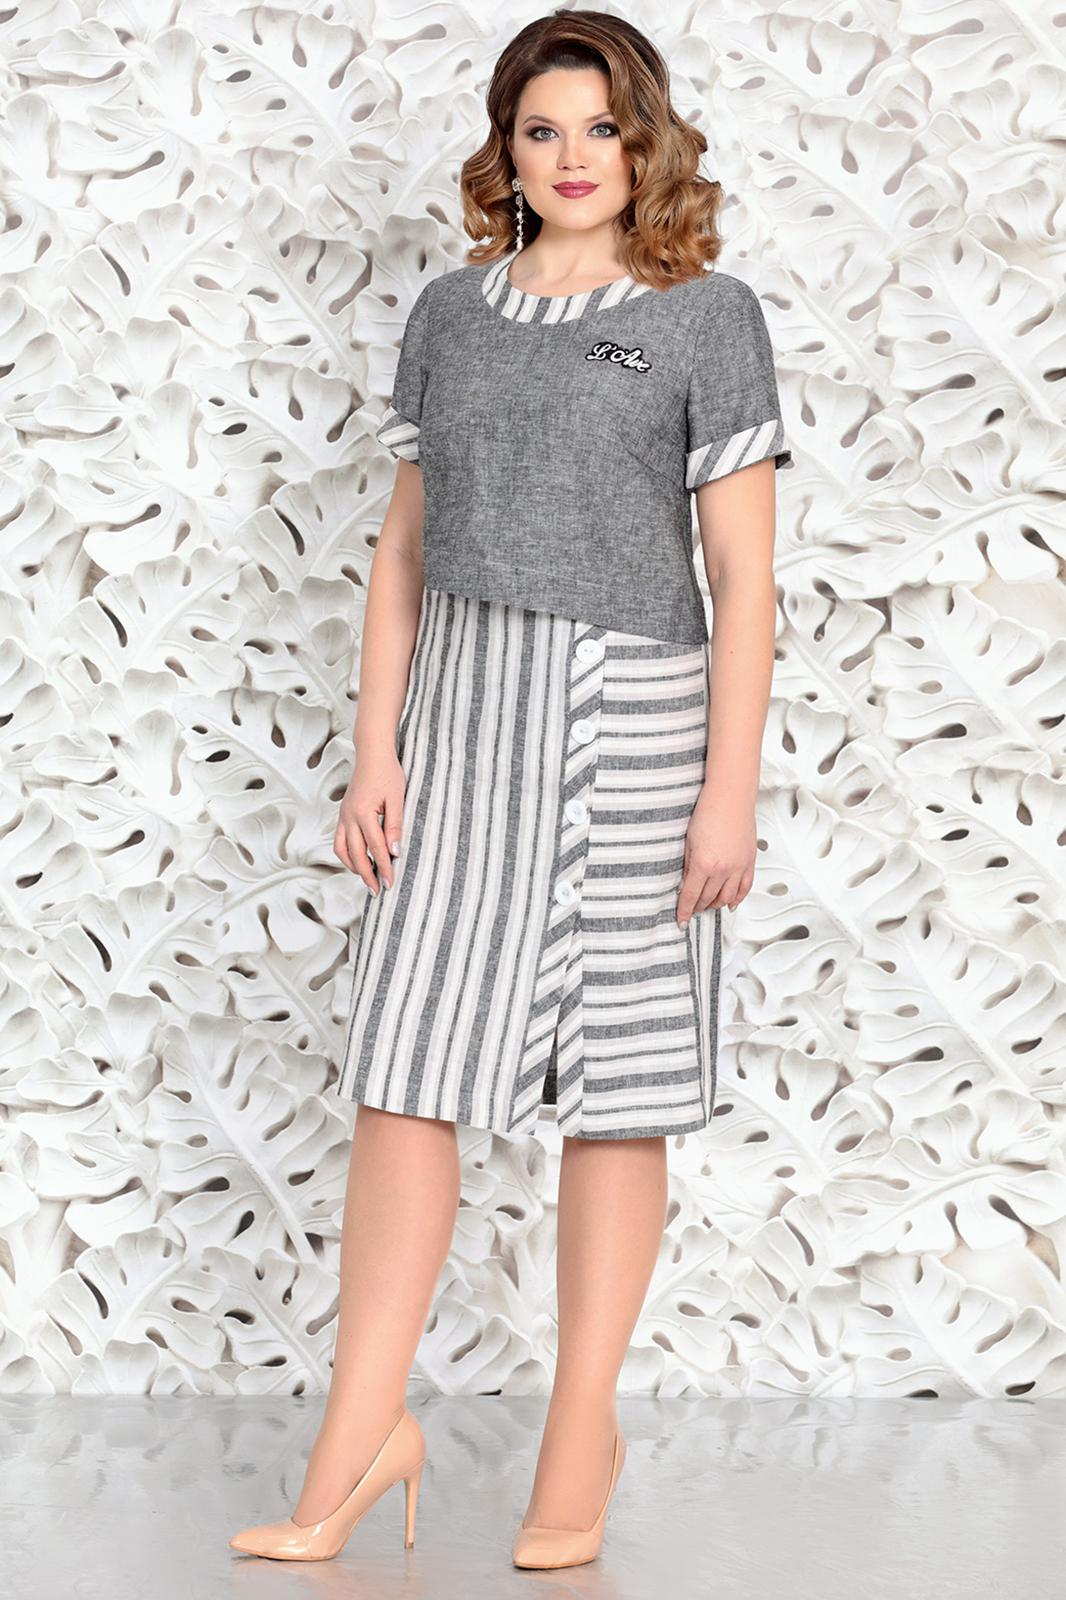 ffed604c1 Платье Mira Fashion, серый (модель 4602) — Белорусский трикотаж в ...